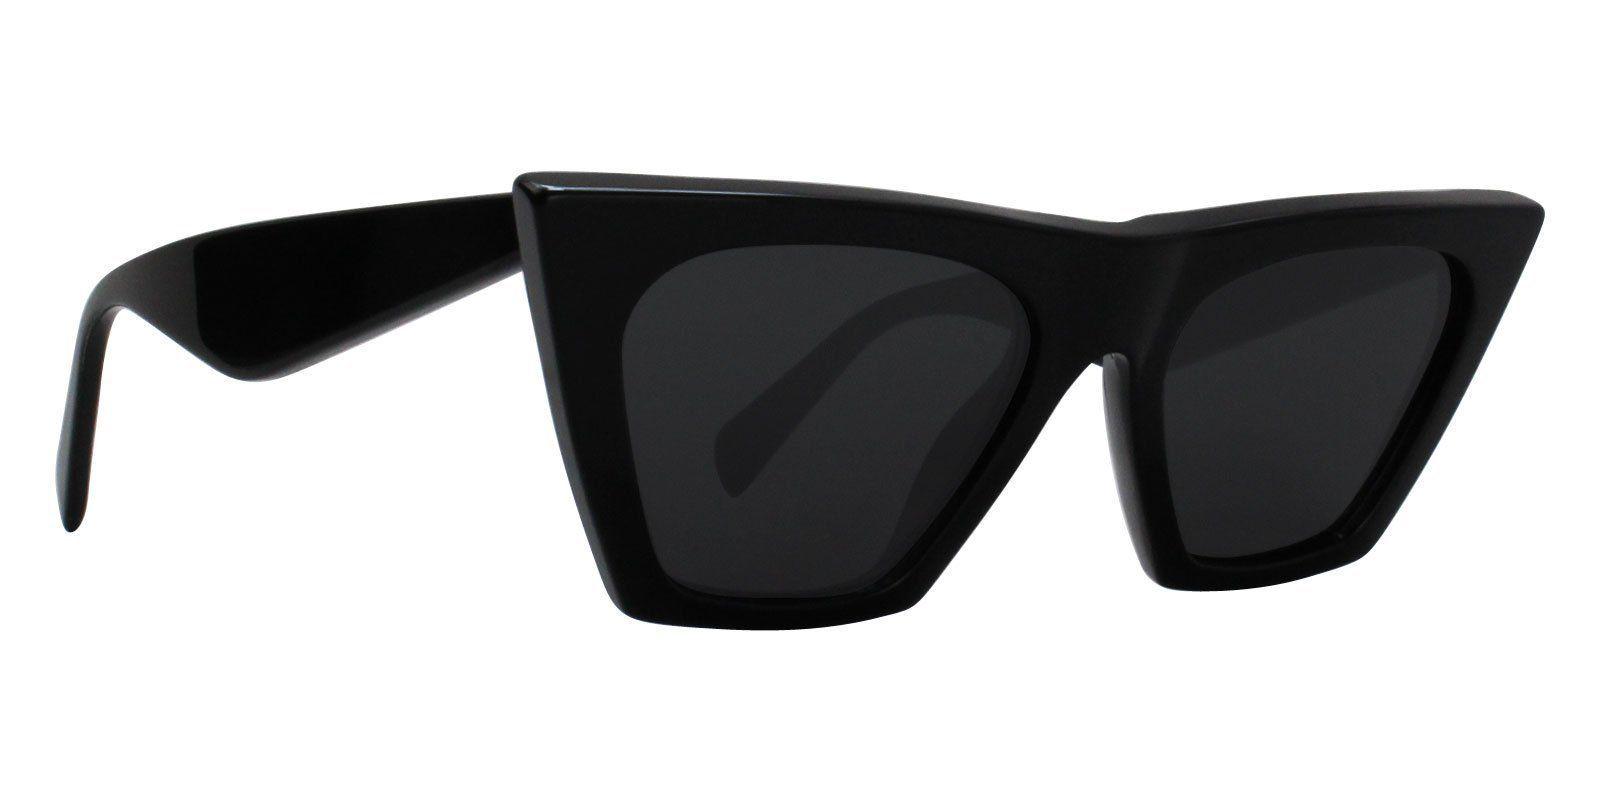 3b0e4a4916 Hailey Baldwin Wearing Celine CL41468 S Sunglasses– Designer Eyes ...